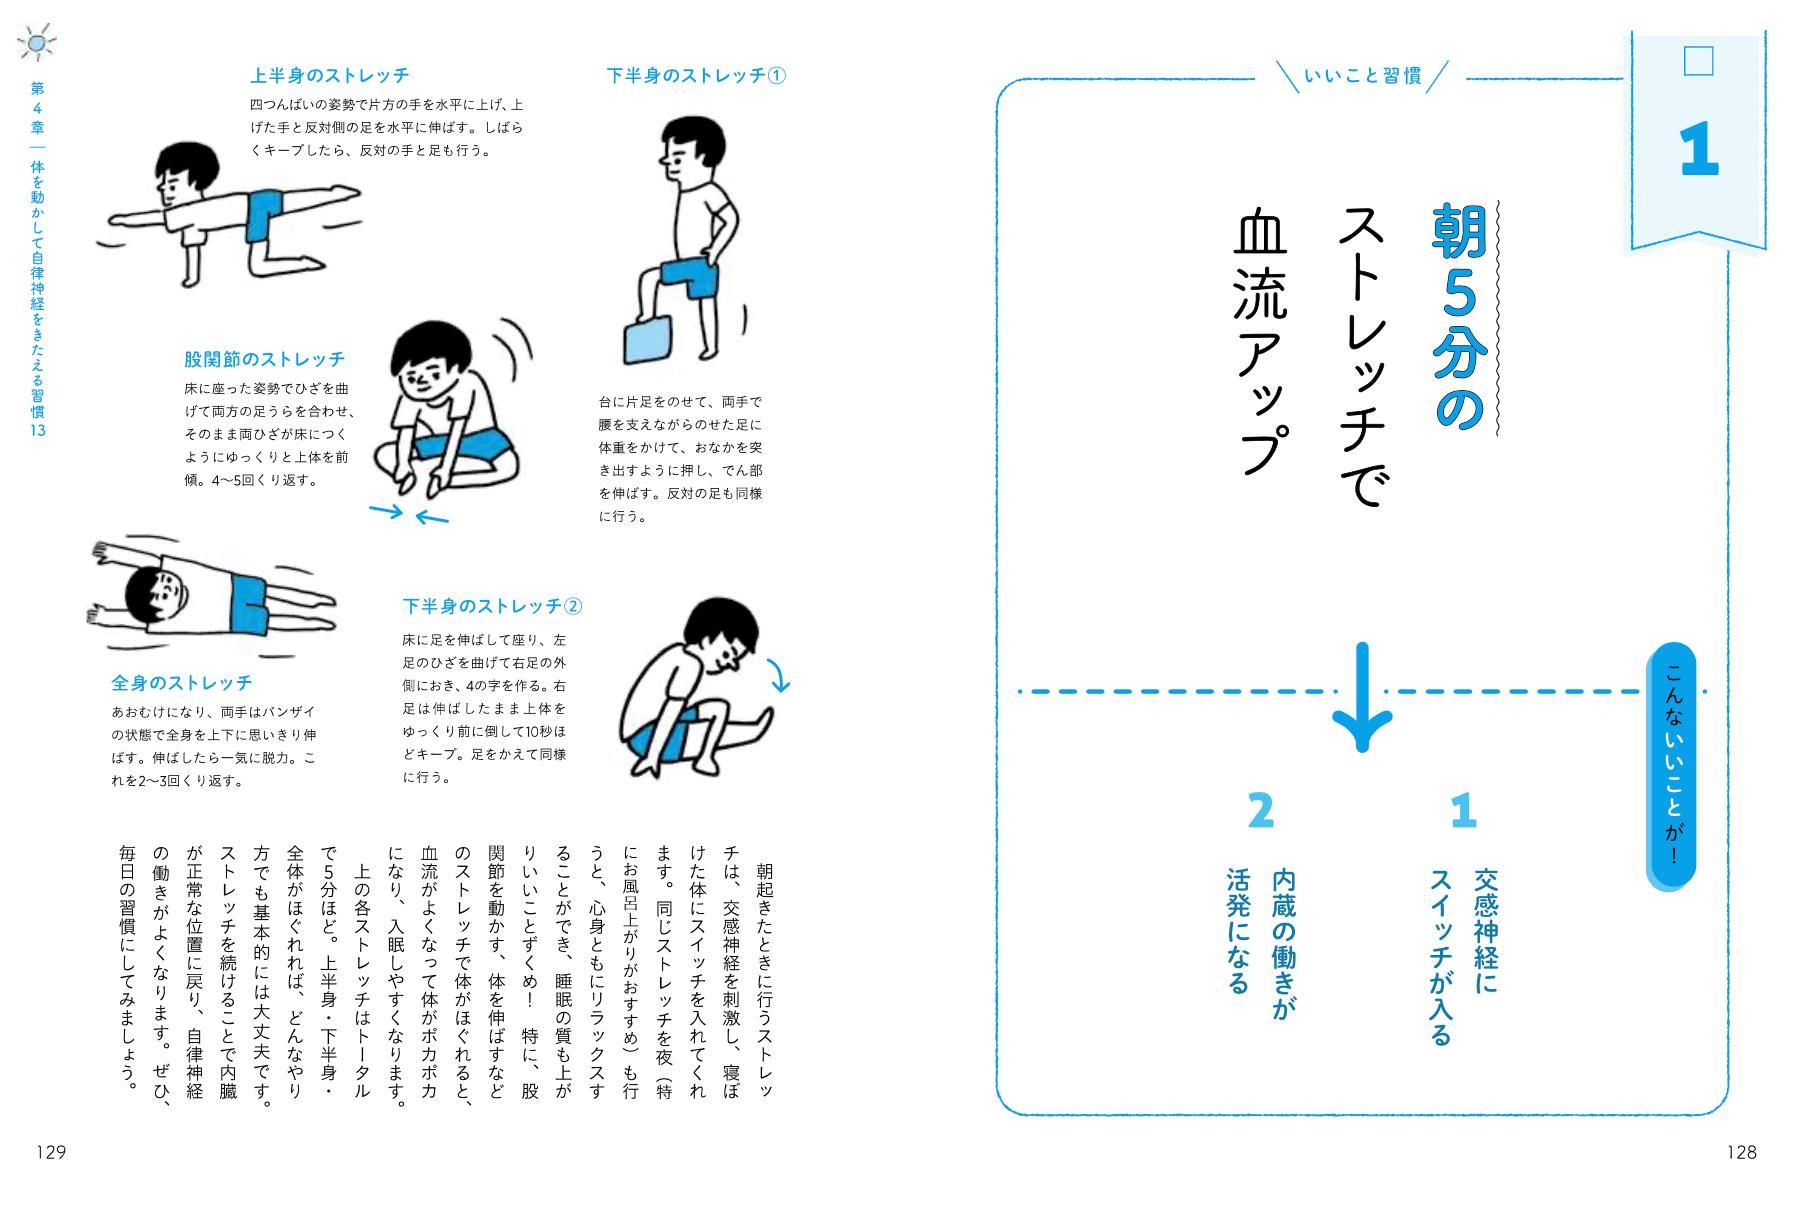 kodomoiikoto_sub3.jpg